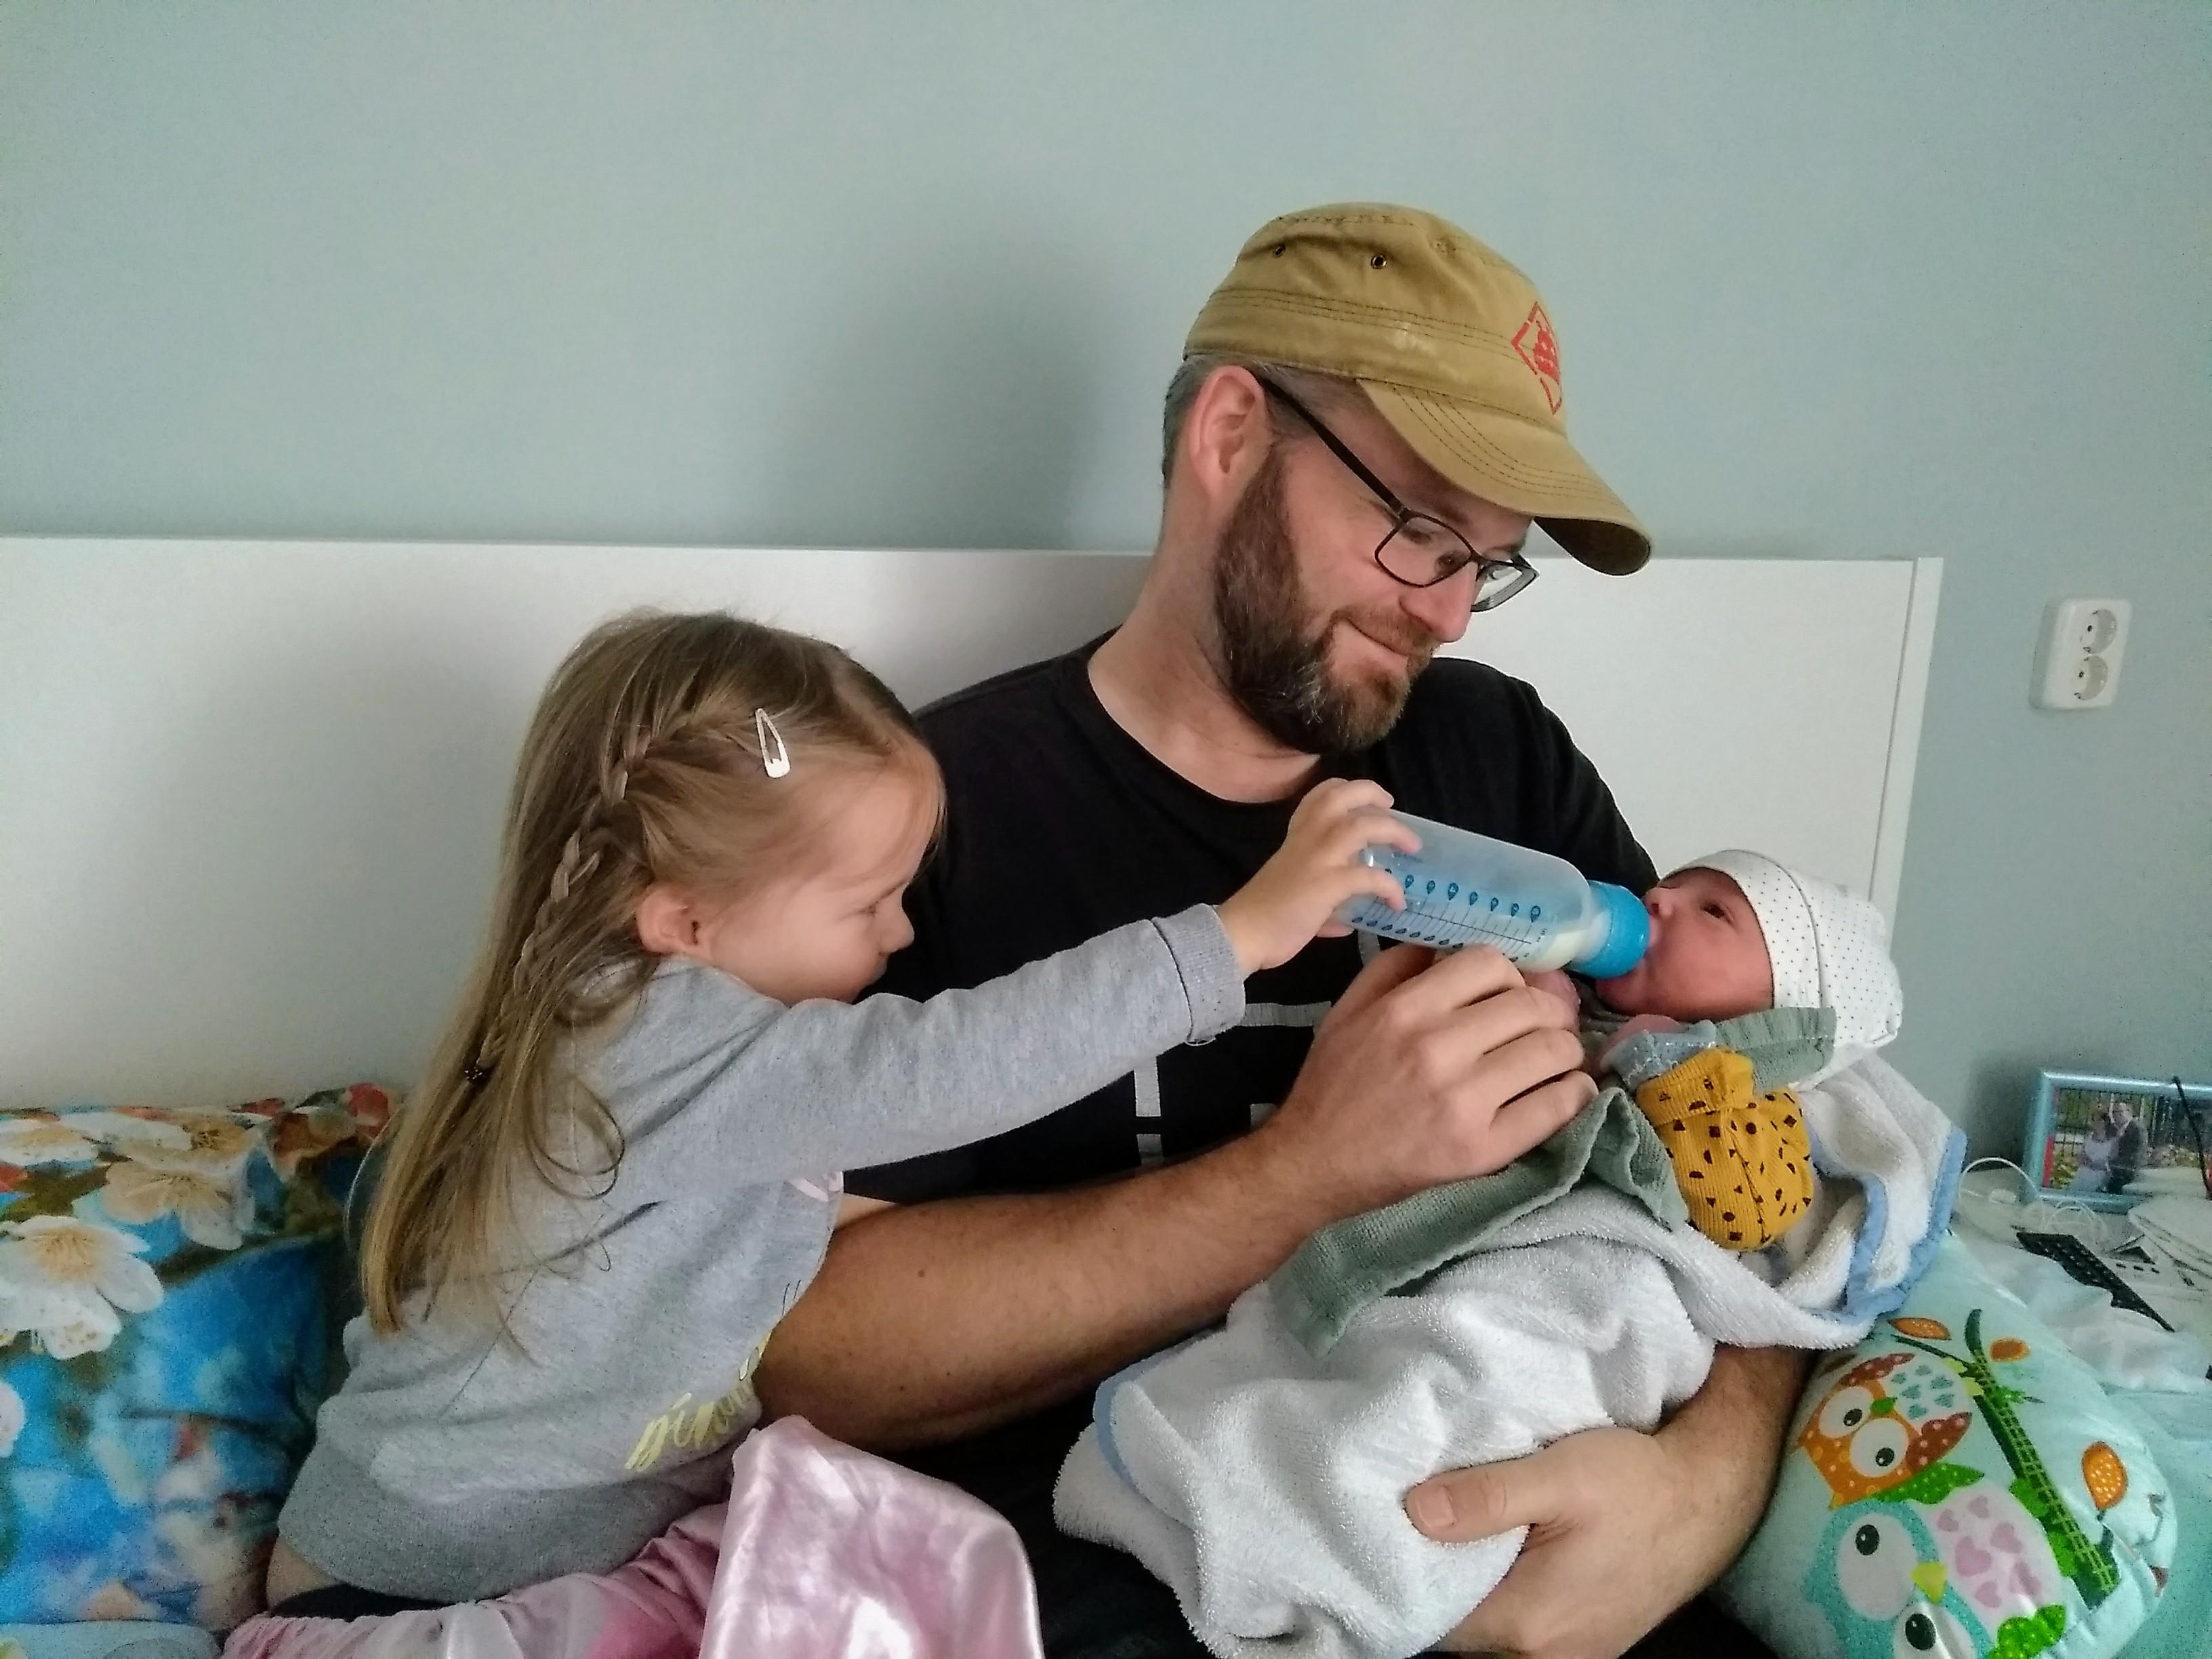 geboren, derde baby, derde kindje, kraamweek, kraamtijd, baby broertje, mamablog, mamalifestyle, blog, lalogblog, lalog.nl